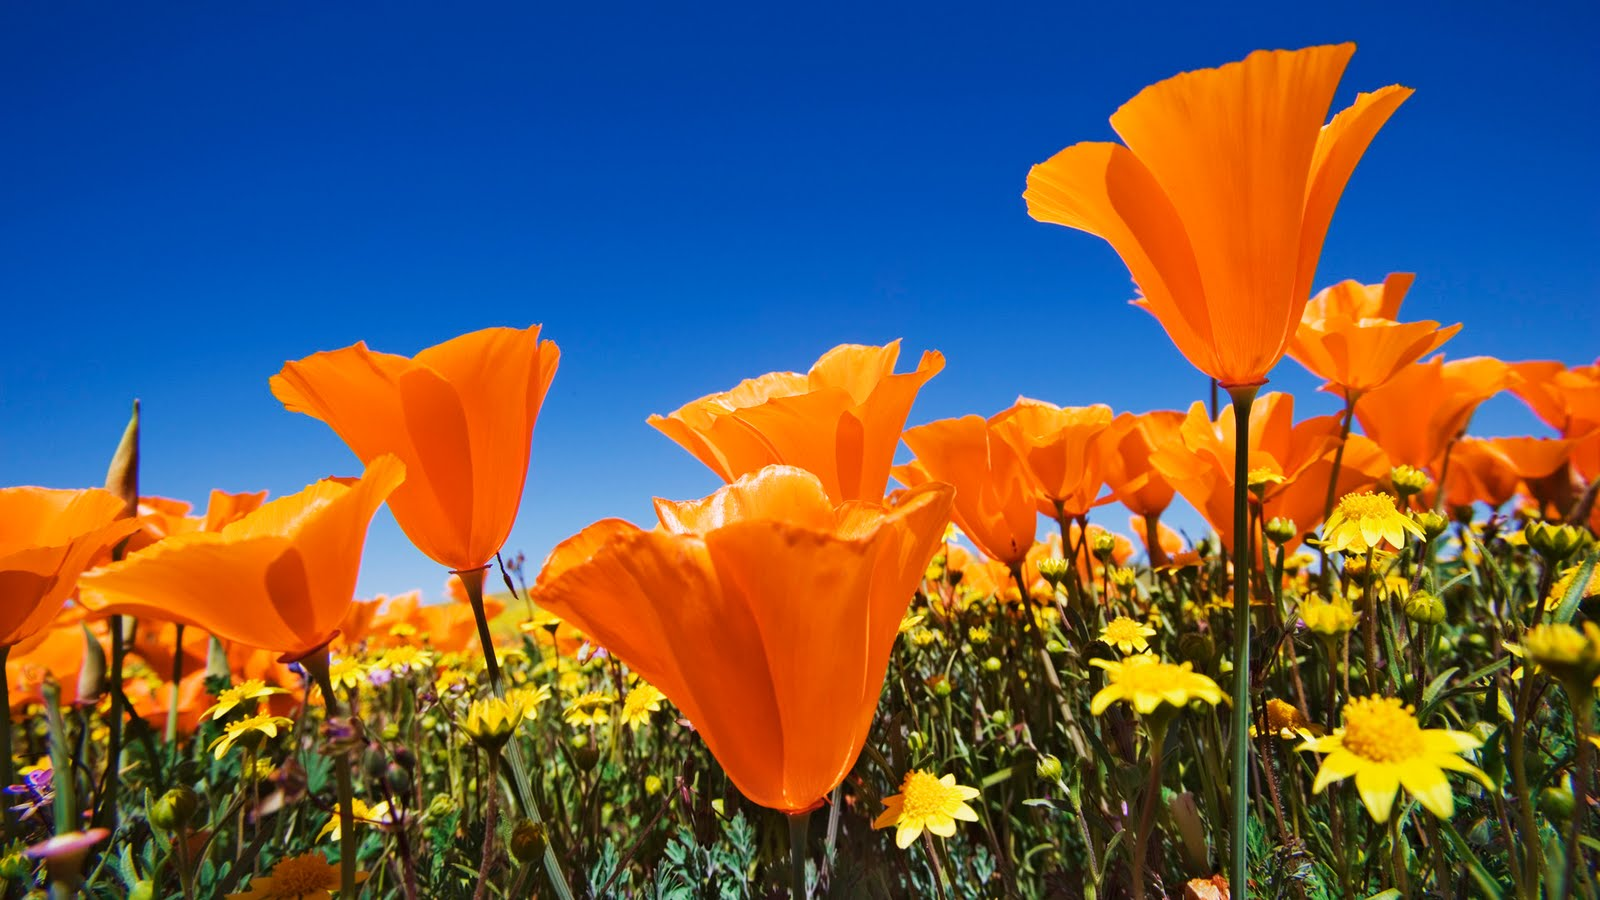 http://4.bp.blogspot.com/-JNvY9Olr7fQ/Tah-pW6MVeI/AAAAAAAAGYs/mqUND5_CSLs/s1600/flowers-wallpaper_1920x1080_83710.jpg